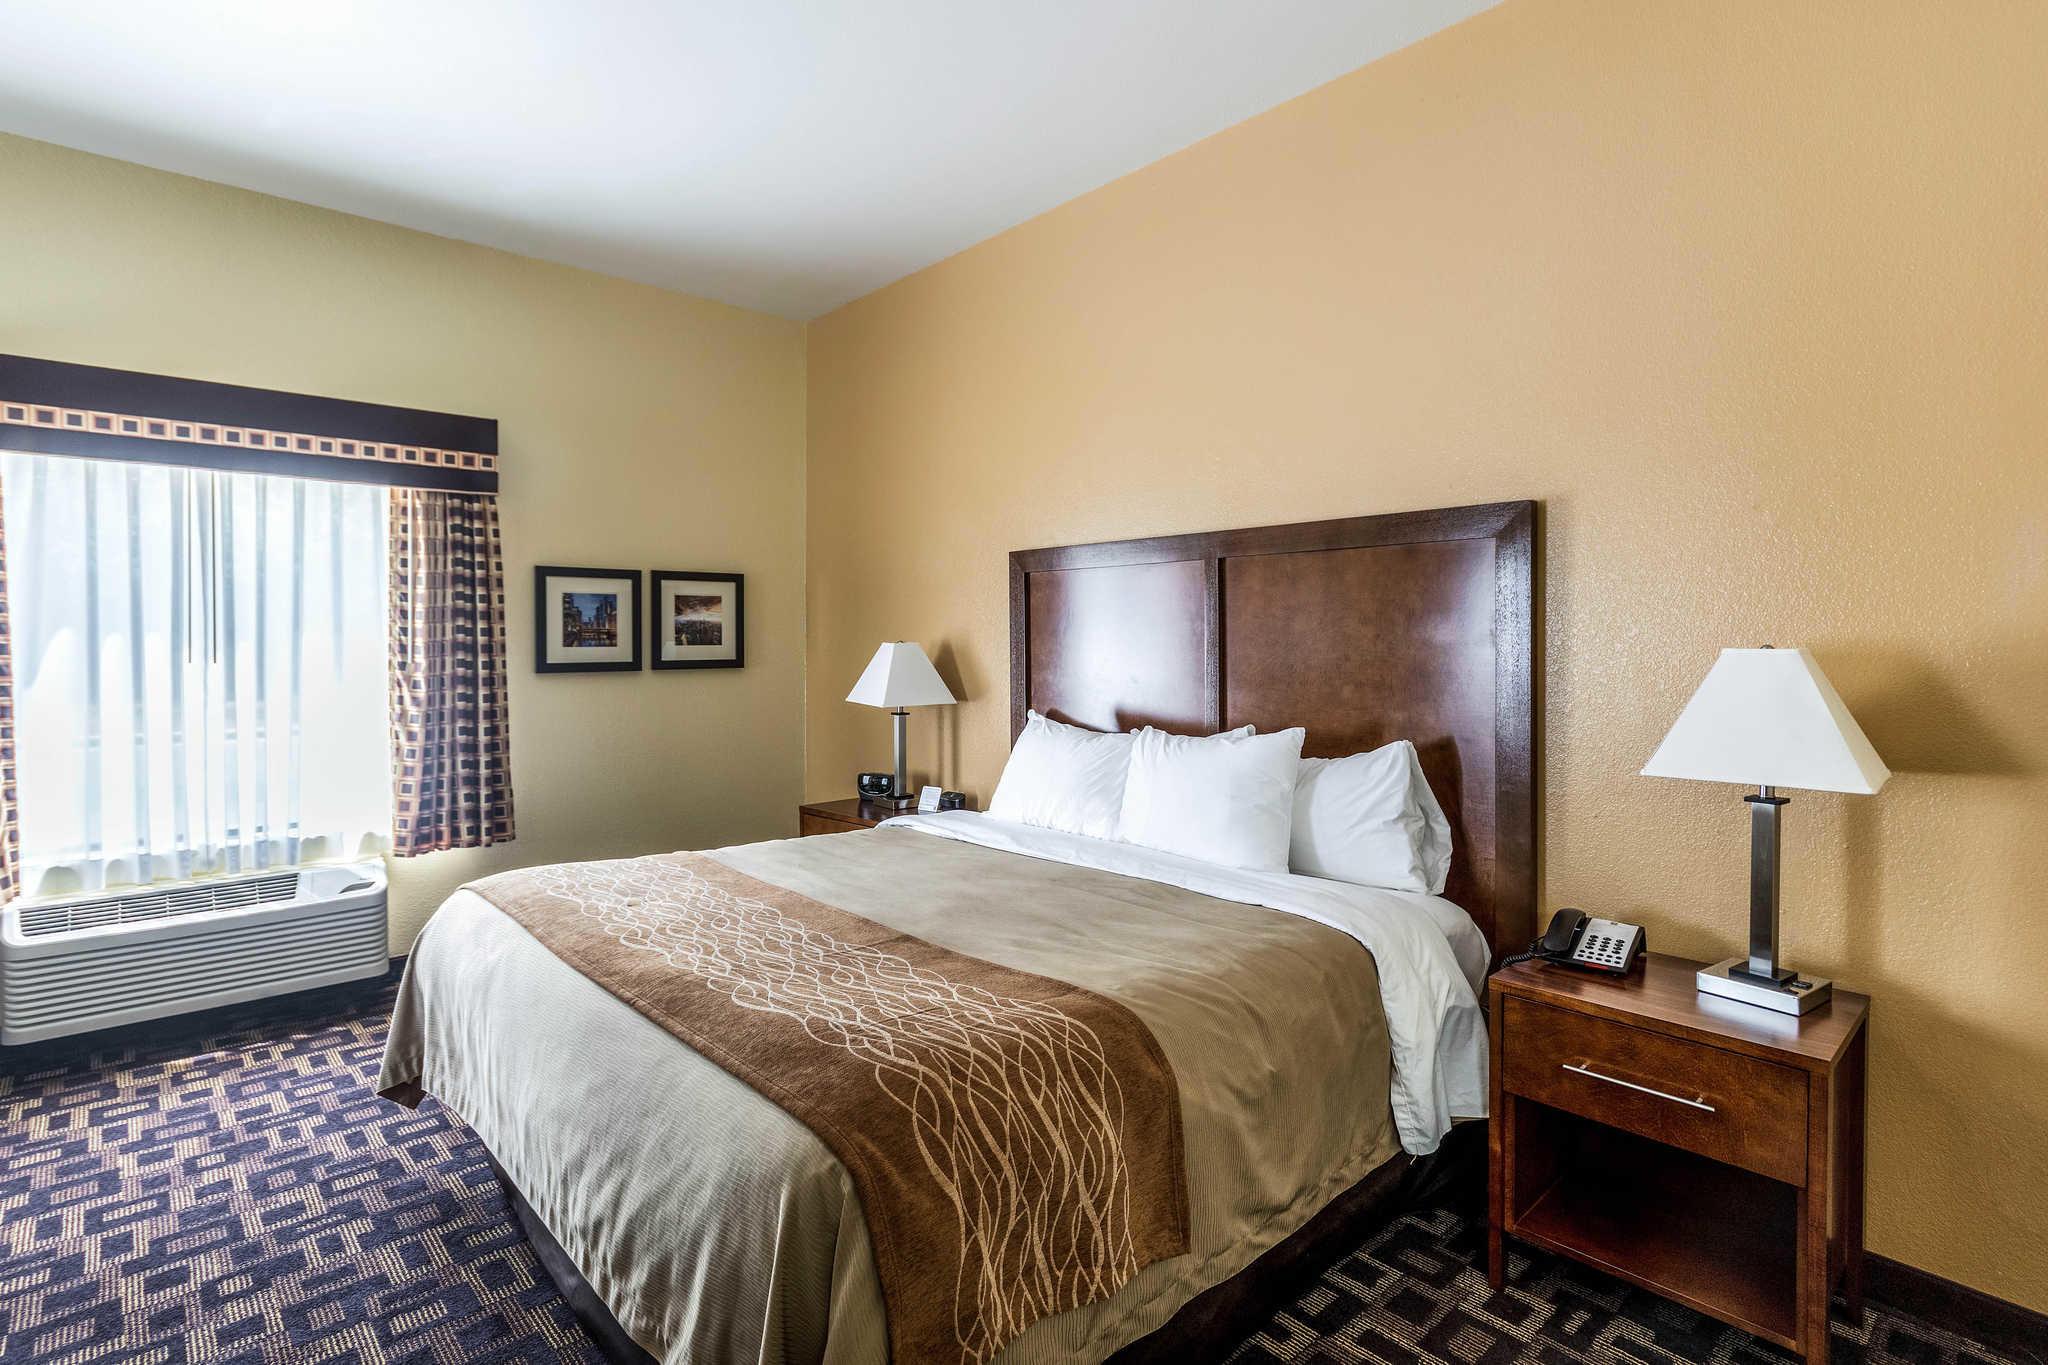 Comfort Inn & Suites North Aurora - Naperville image 26